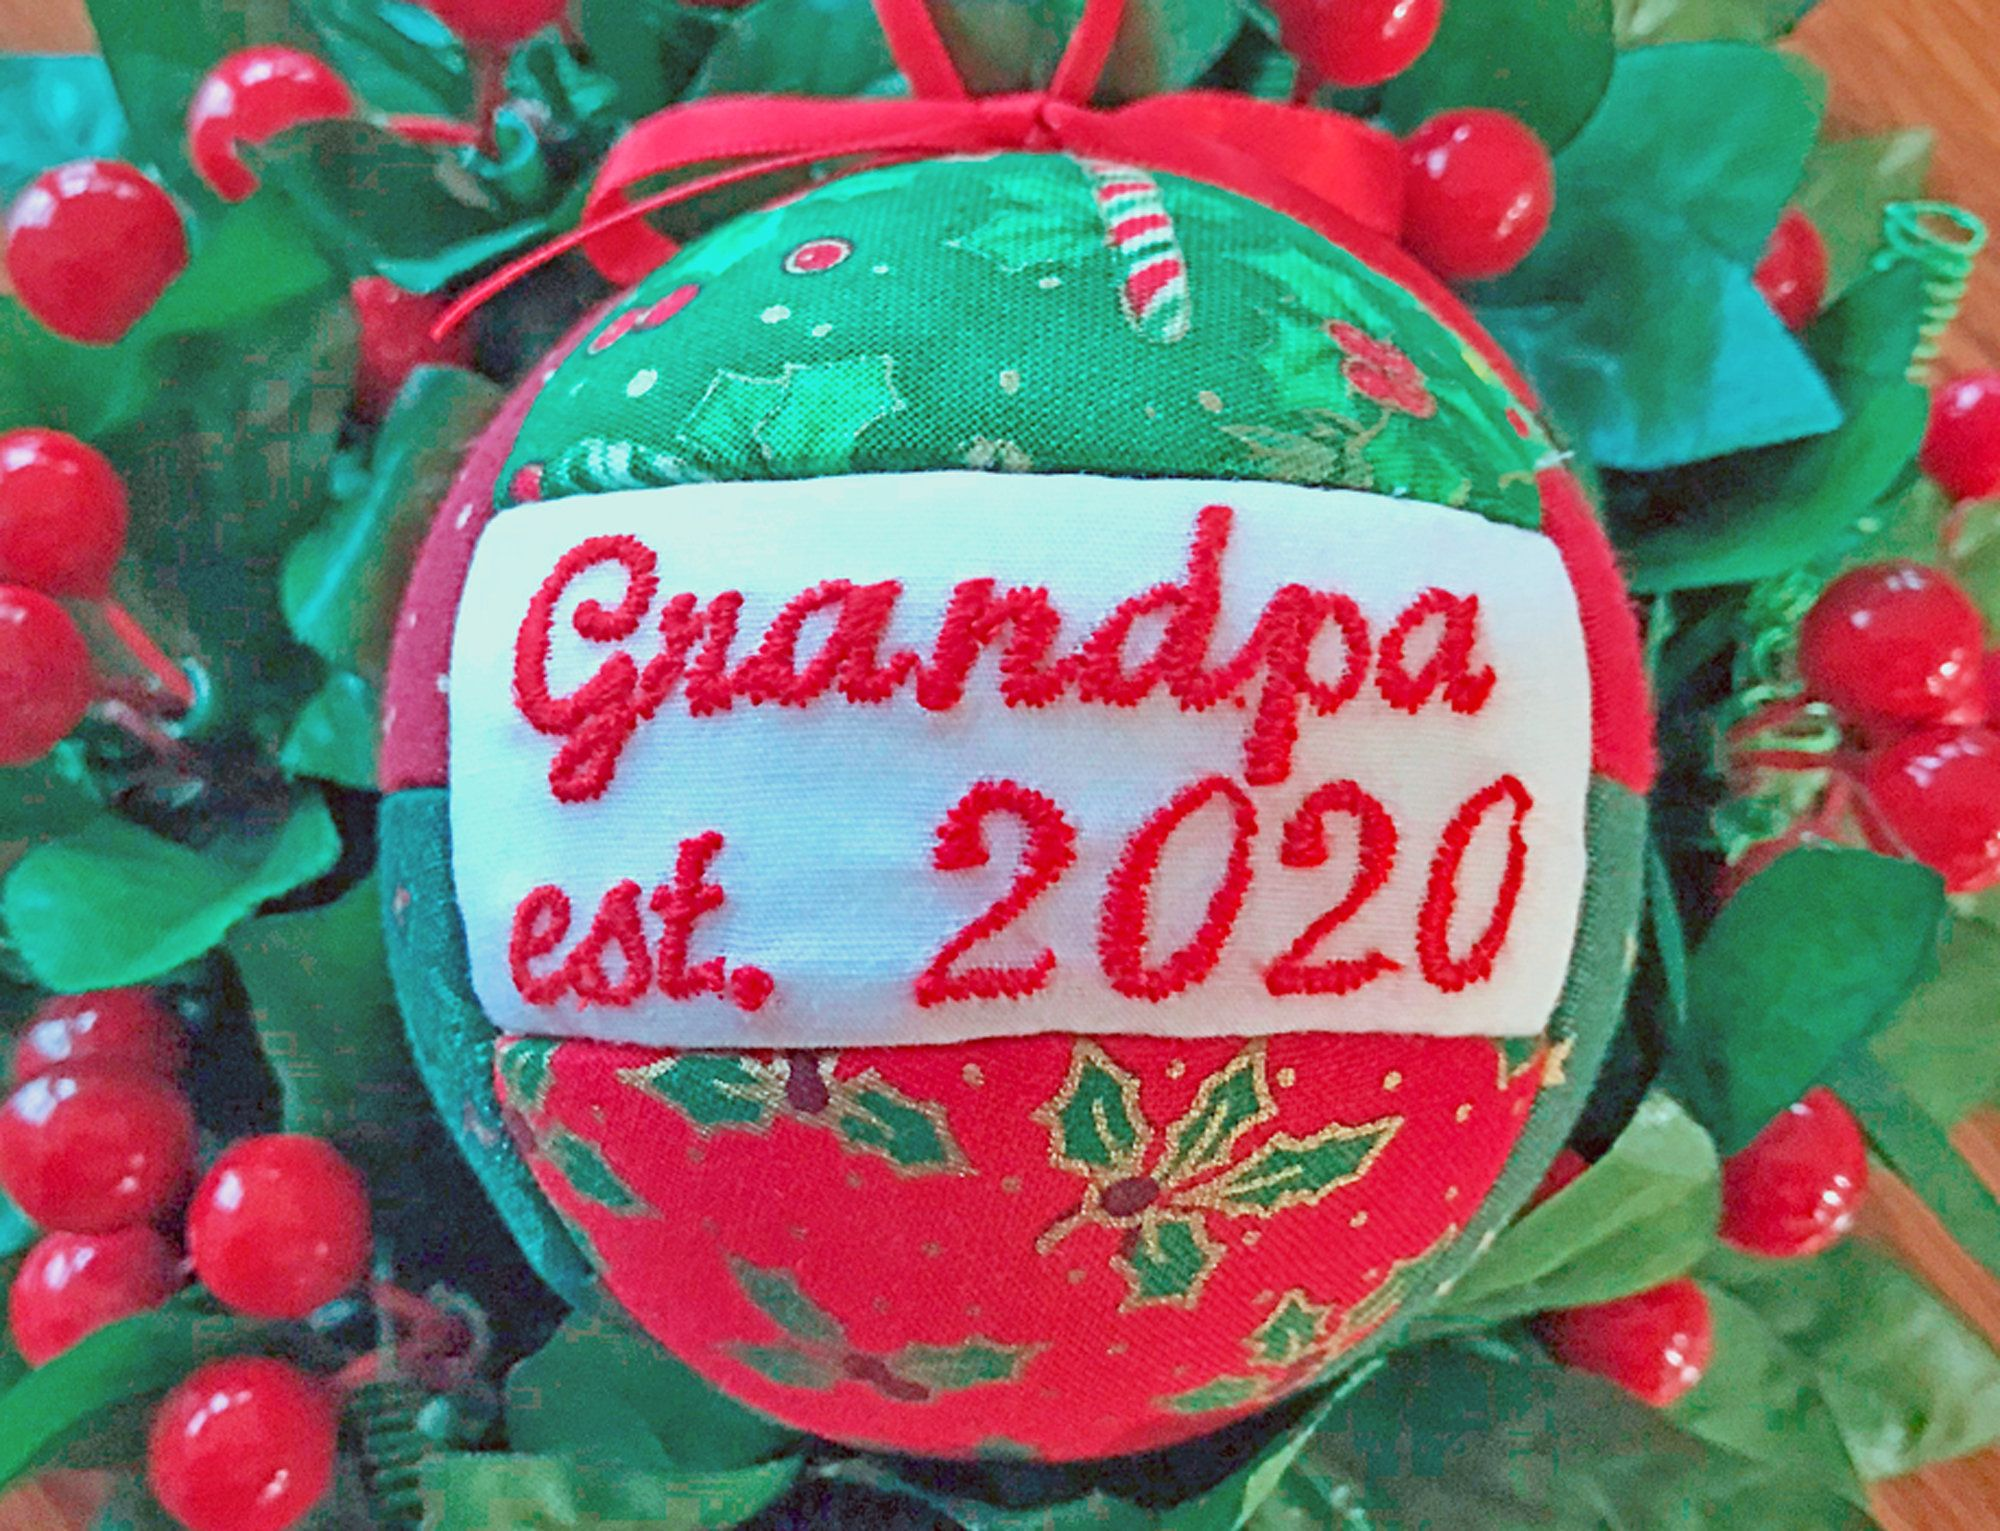 Grandpa est. 2020 Christmas Ornament Handmade Ornaments